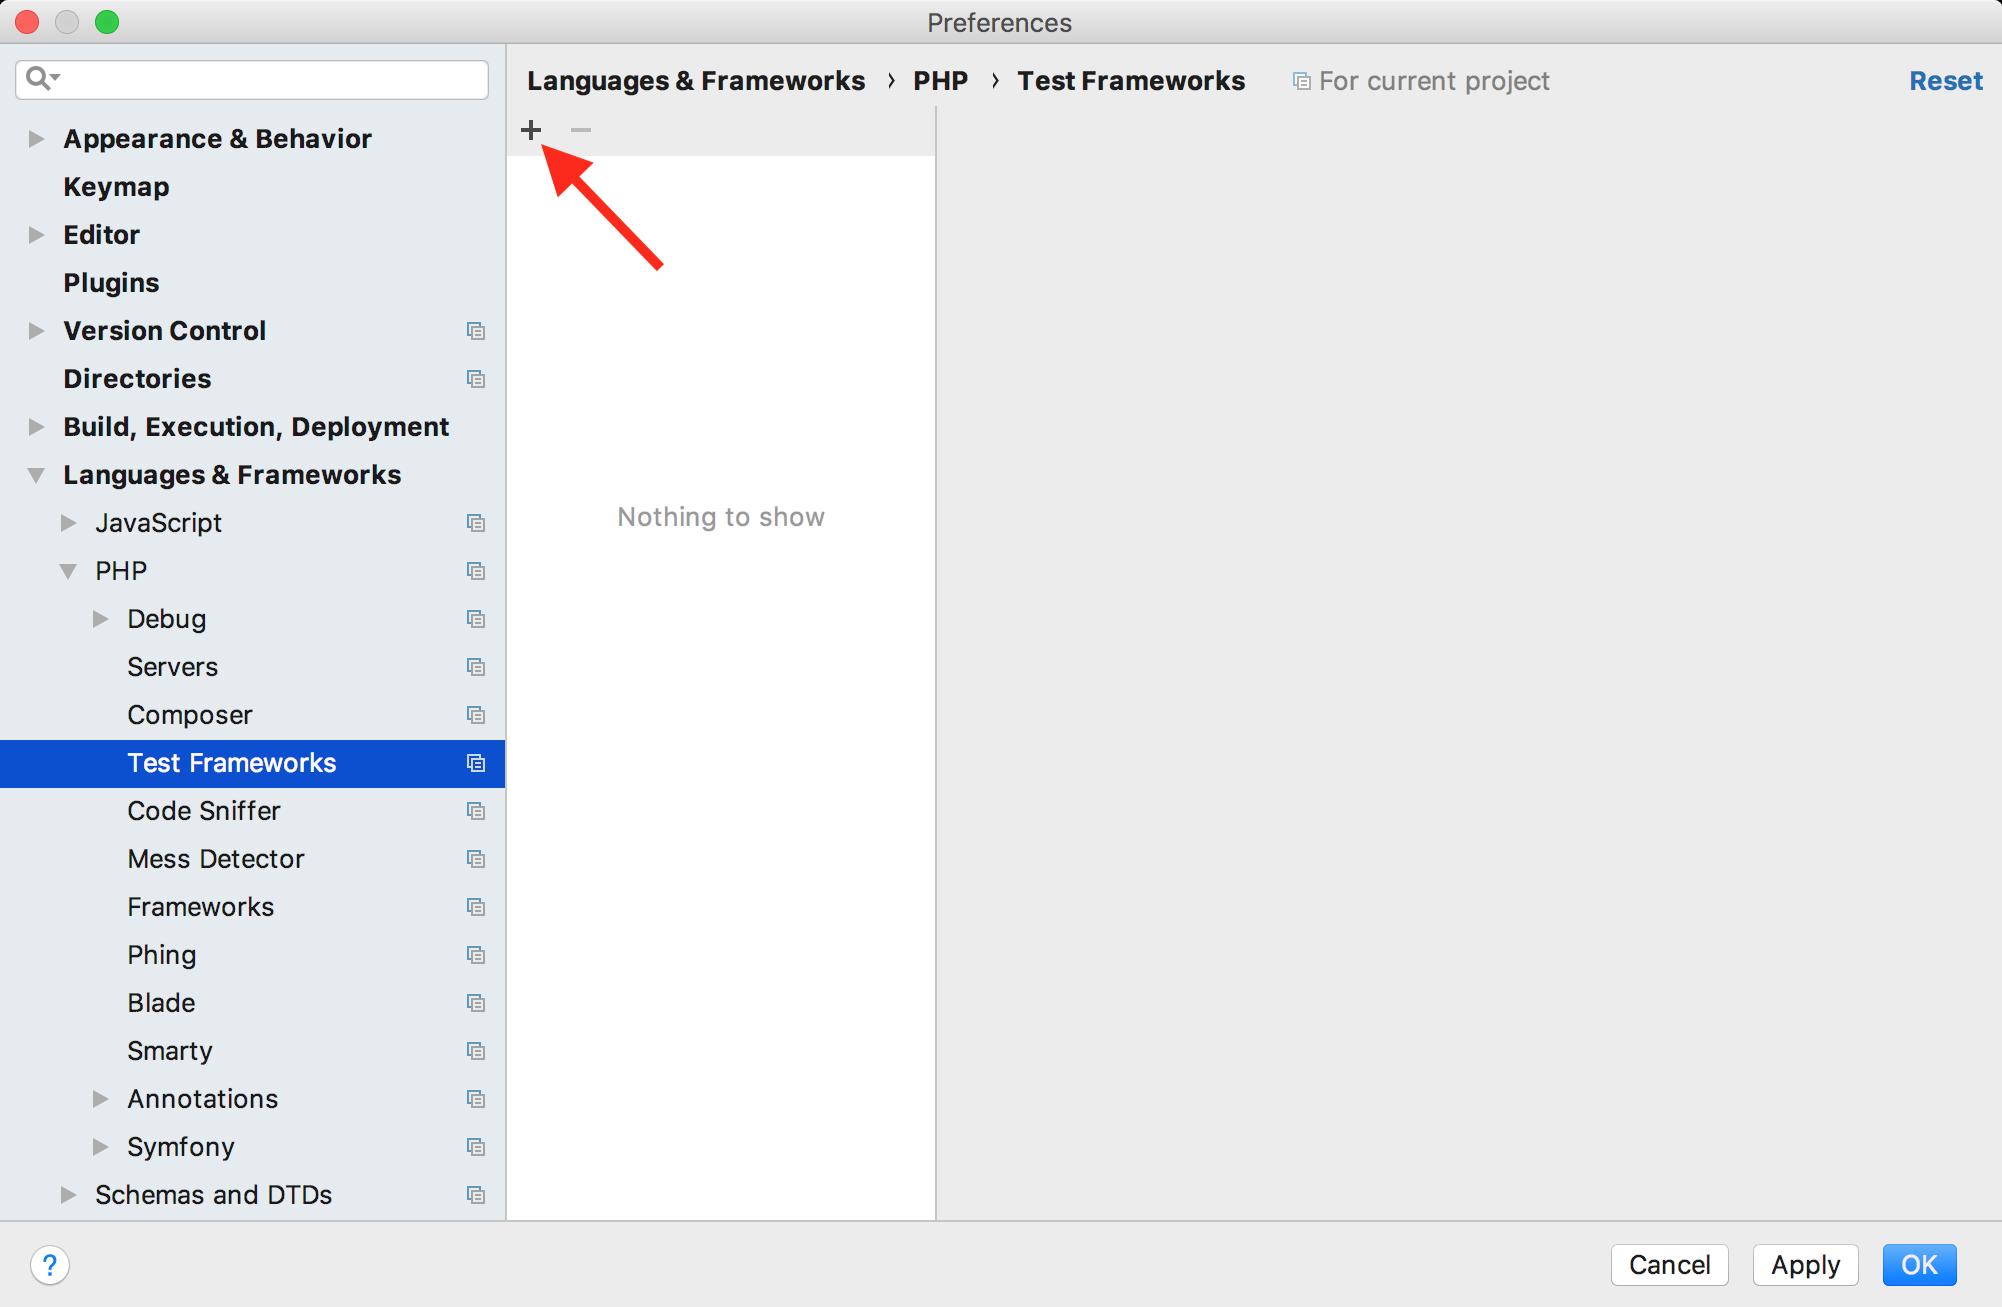 Adding a new test framework (PHPUnit) in PHPStorm